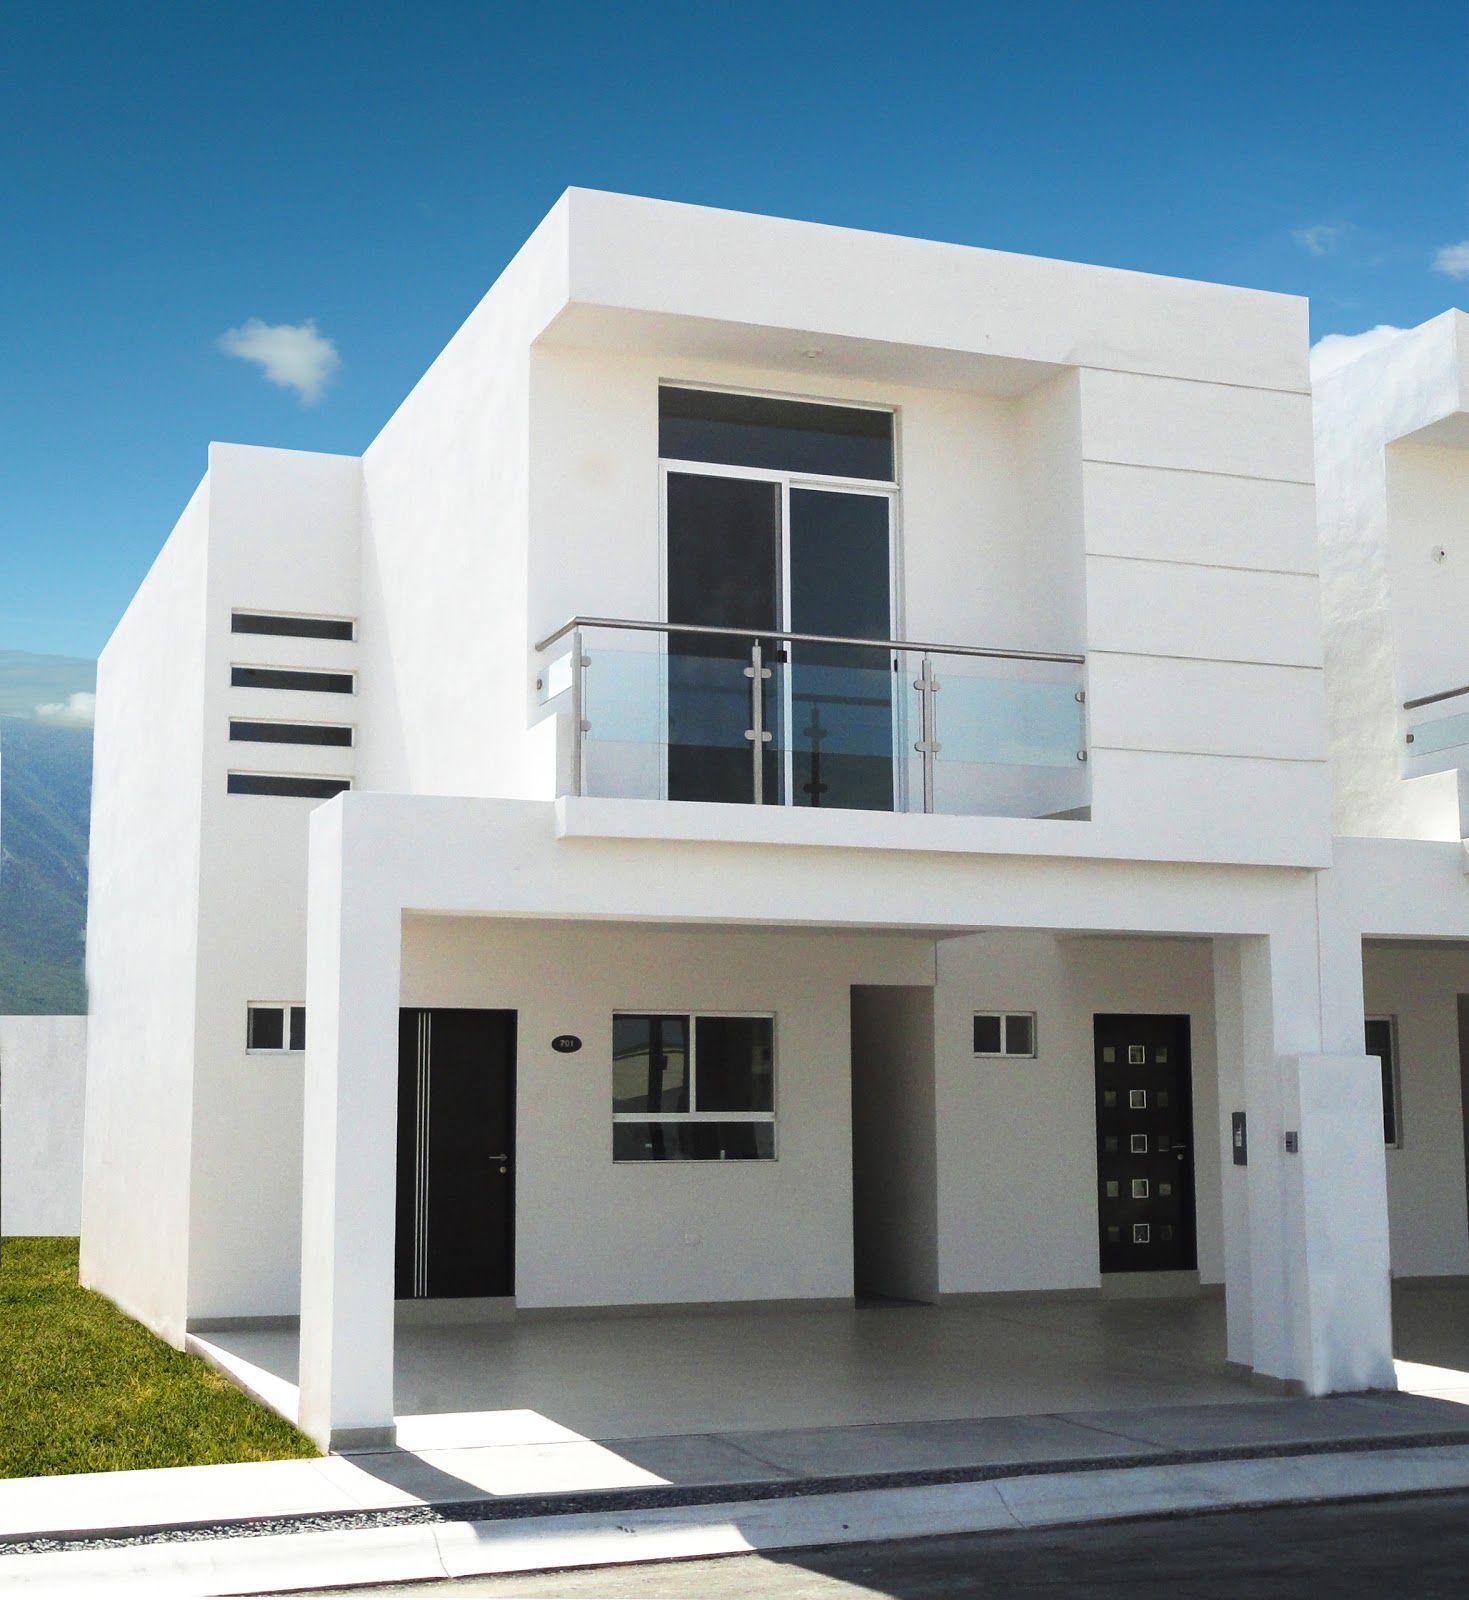 planos de casas pequenas estilo mexicano